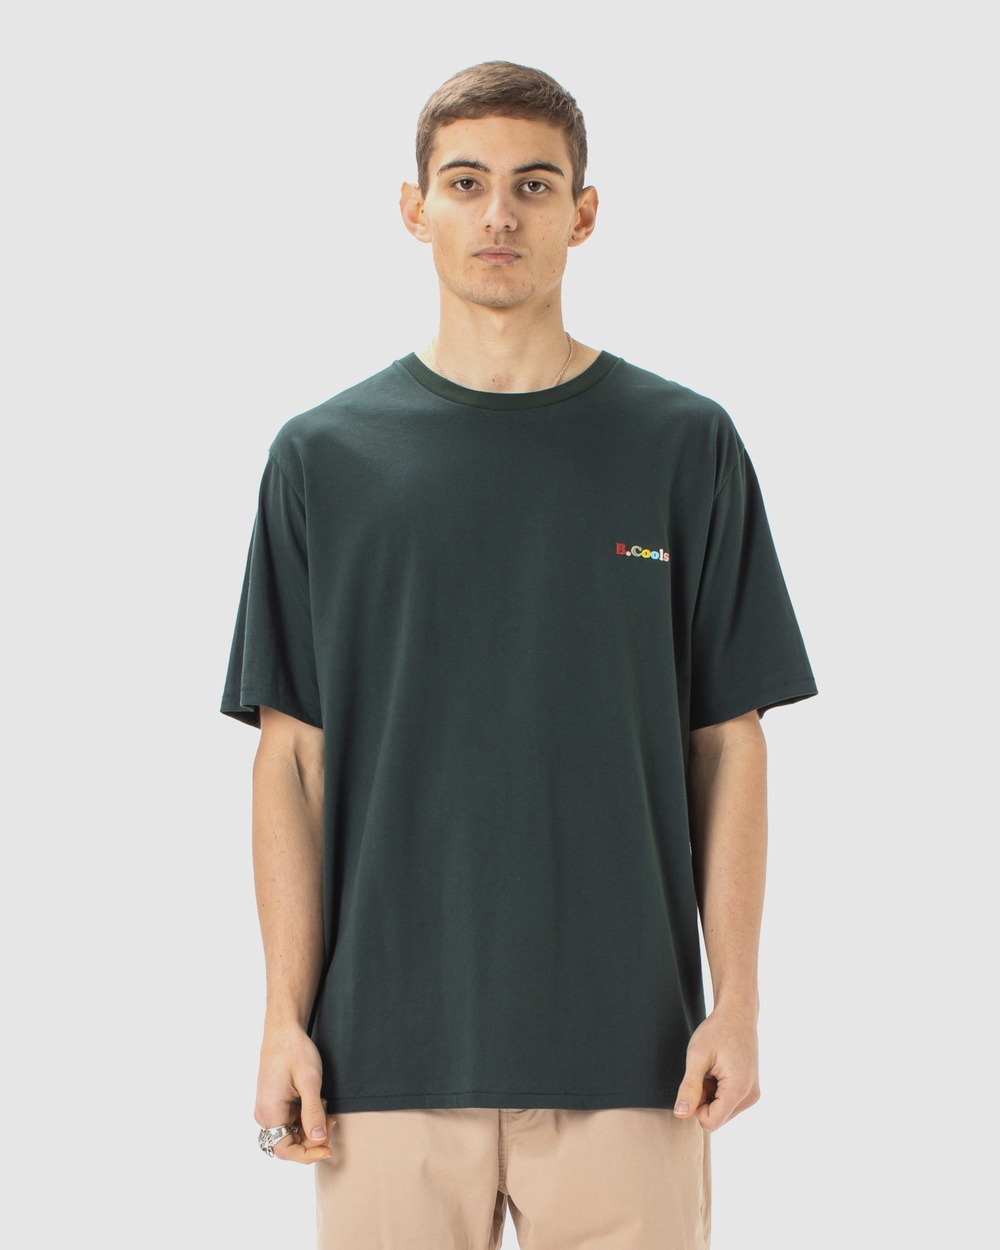 Barney Cools B.Cools Embro Tee Long Sleeve T-Shirts Forest Australia